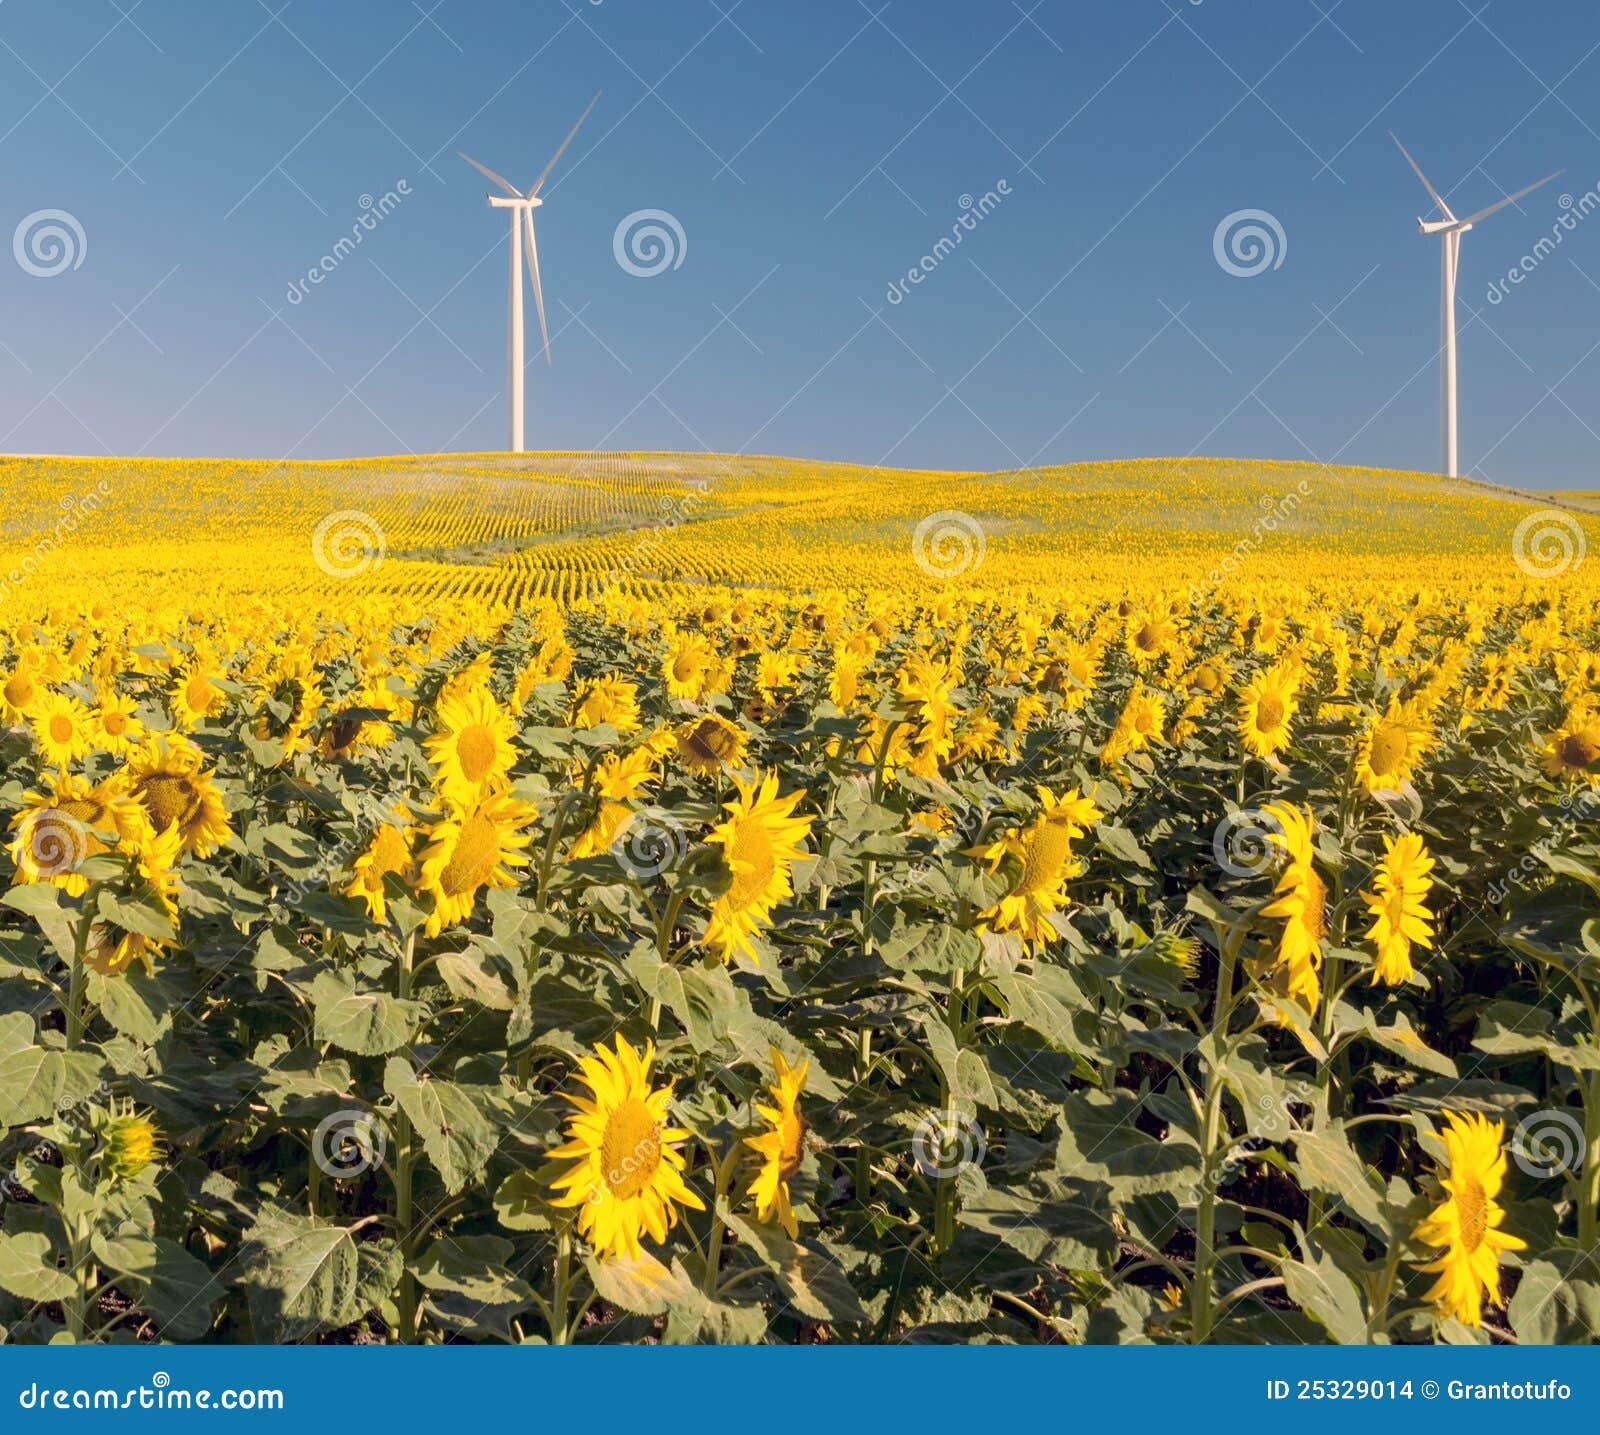 sunflower fields 2 by - photo #45